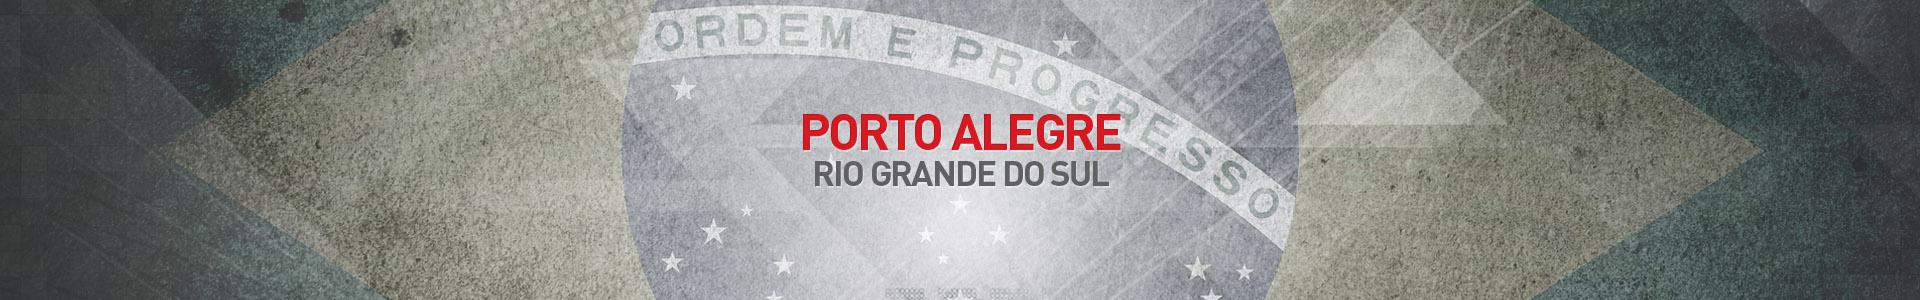 Topo-Cidades-Porto-Alegre-SBA